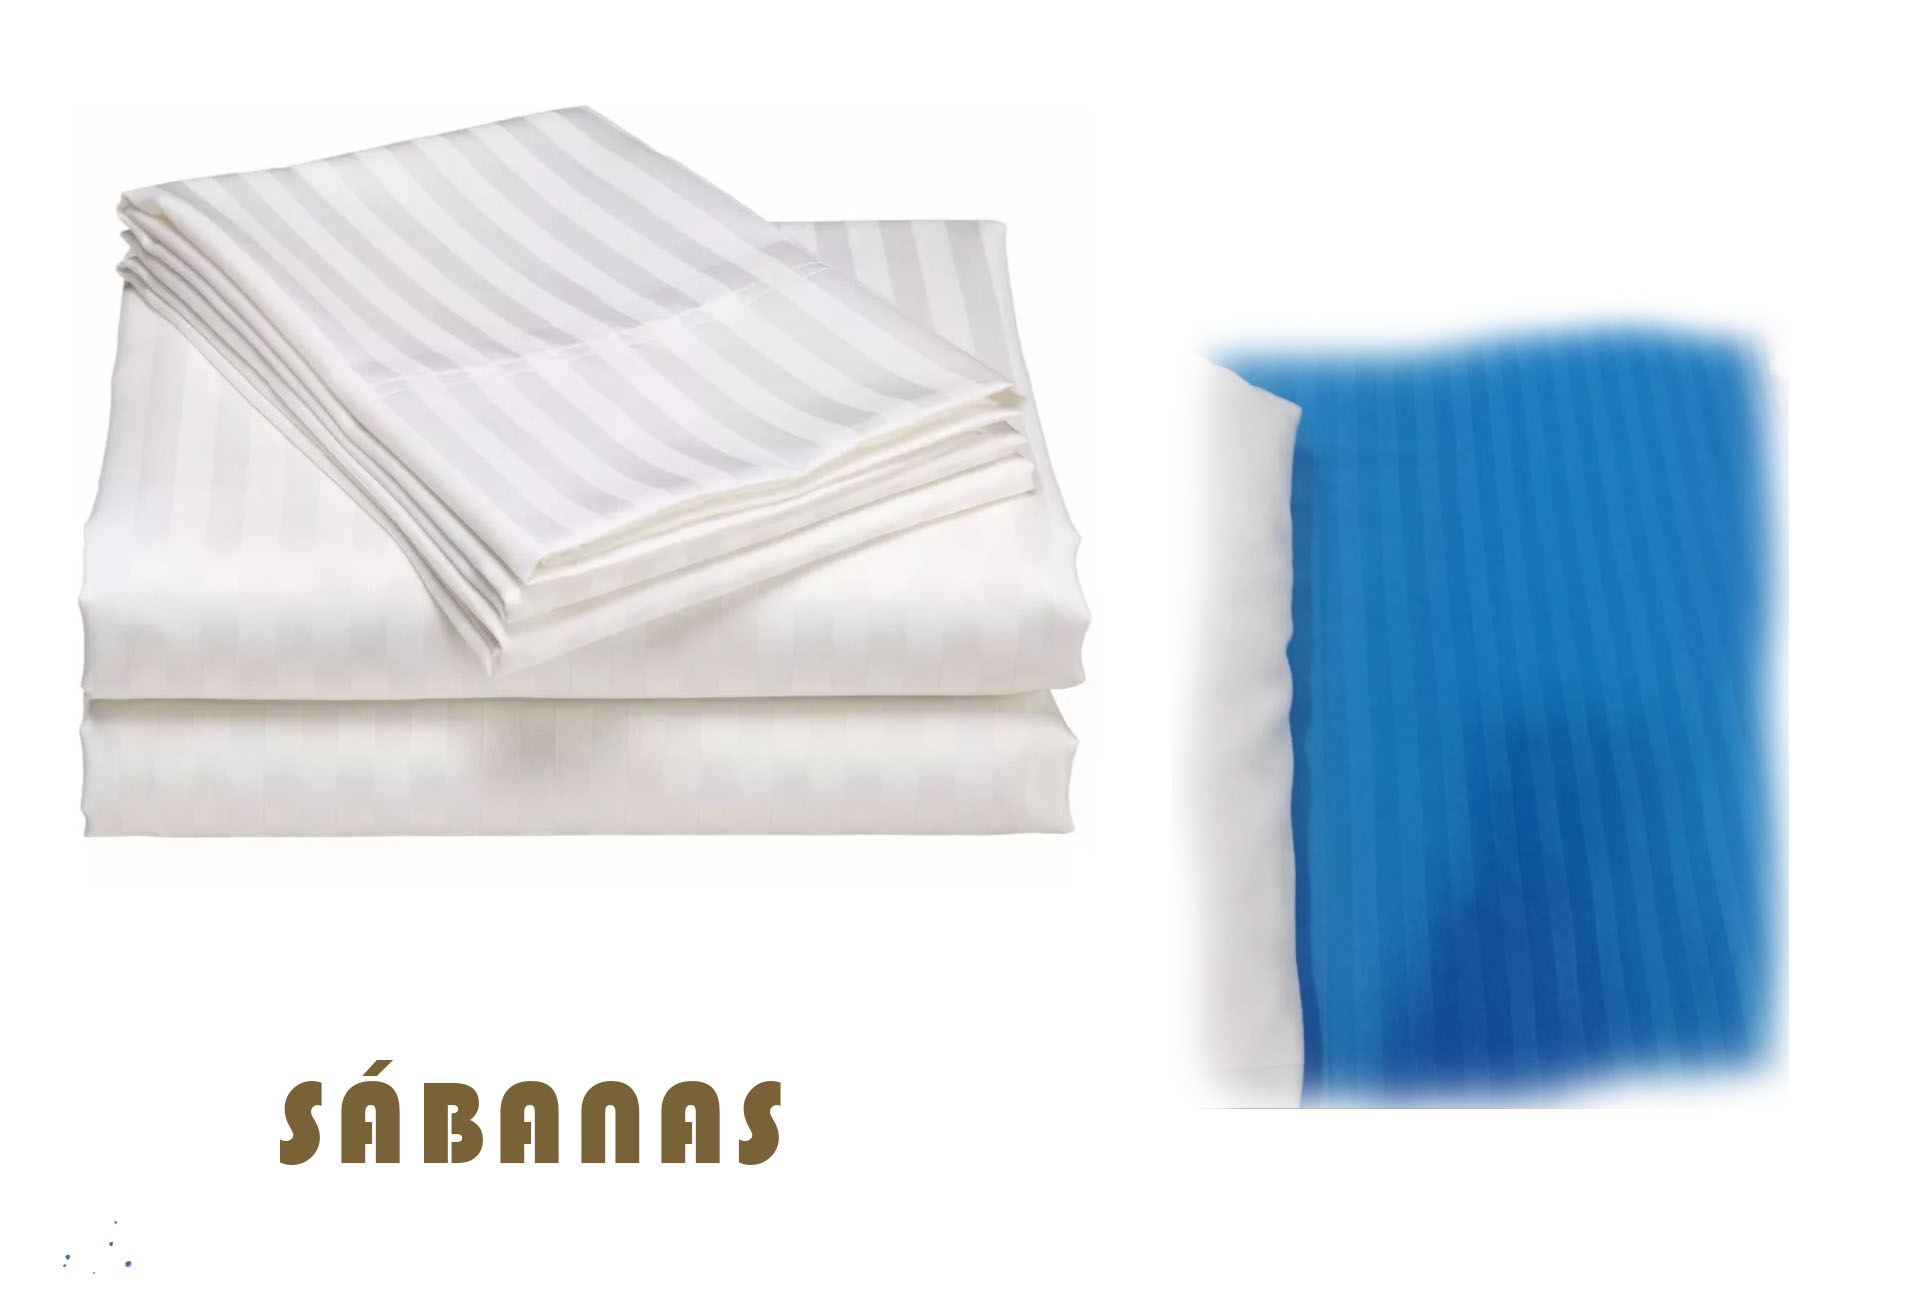 Pastell - Sábanas